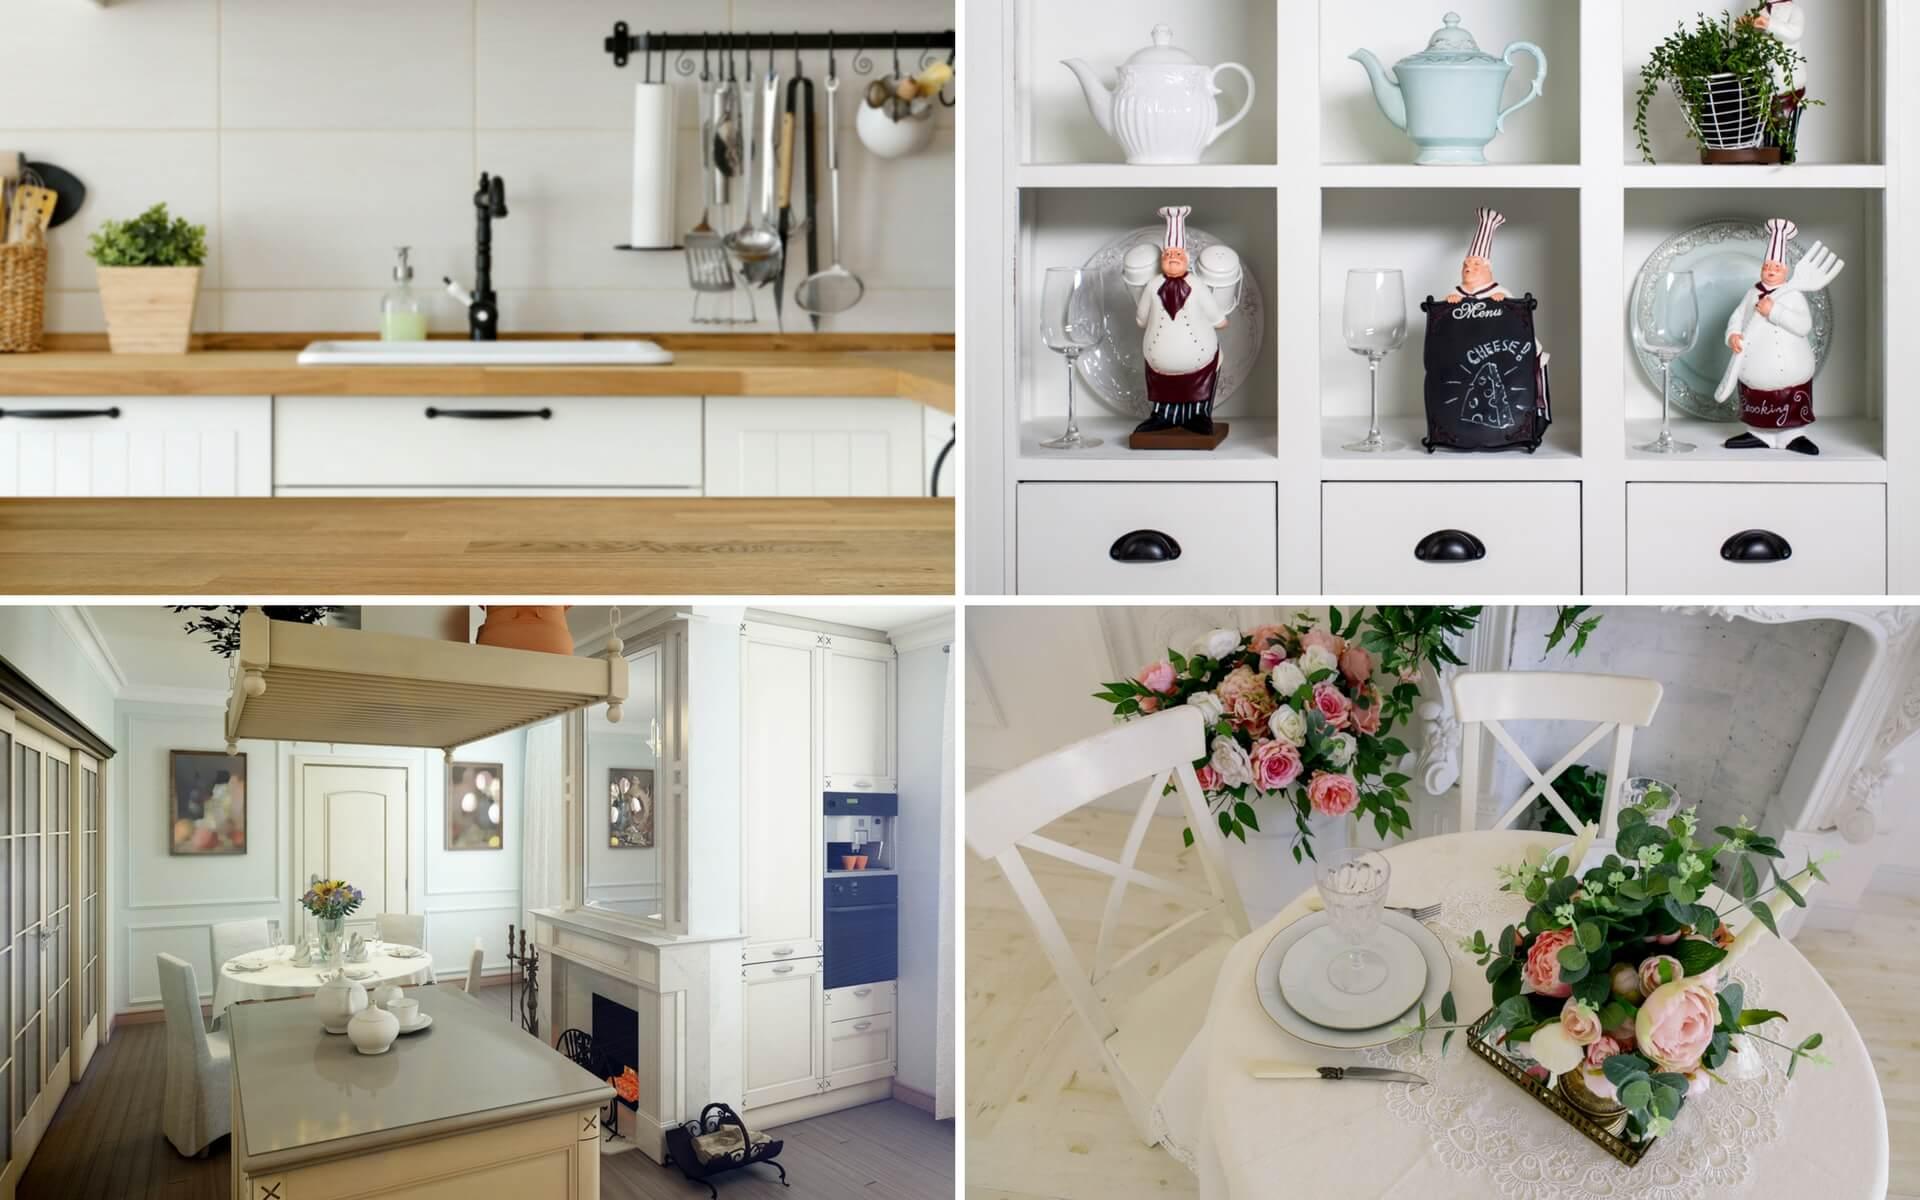 I mobili e gli accessori di una cucina provenzale moderna - Mobili in stile francese ...